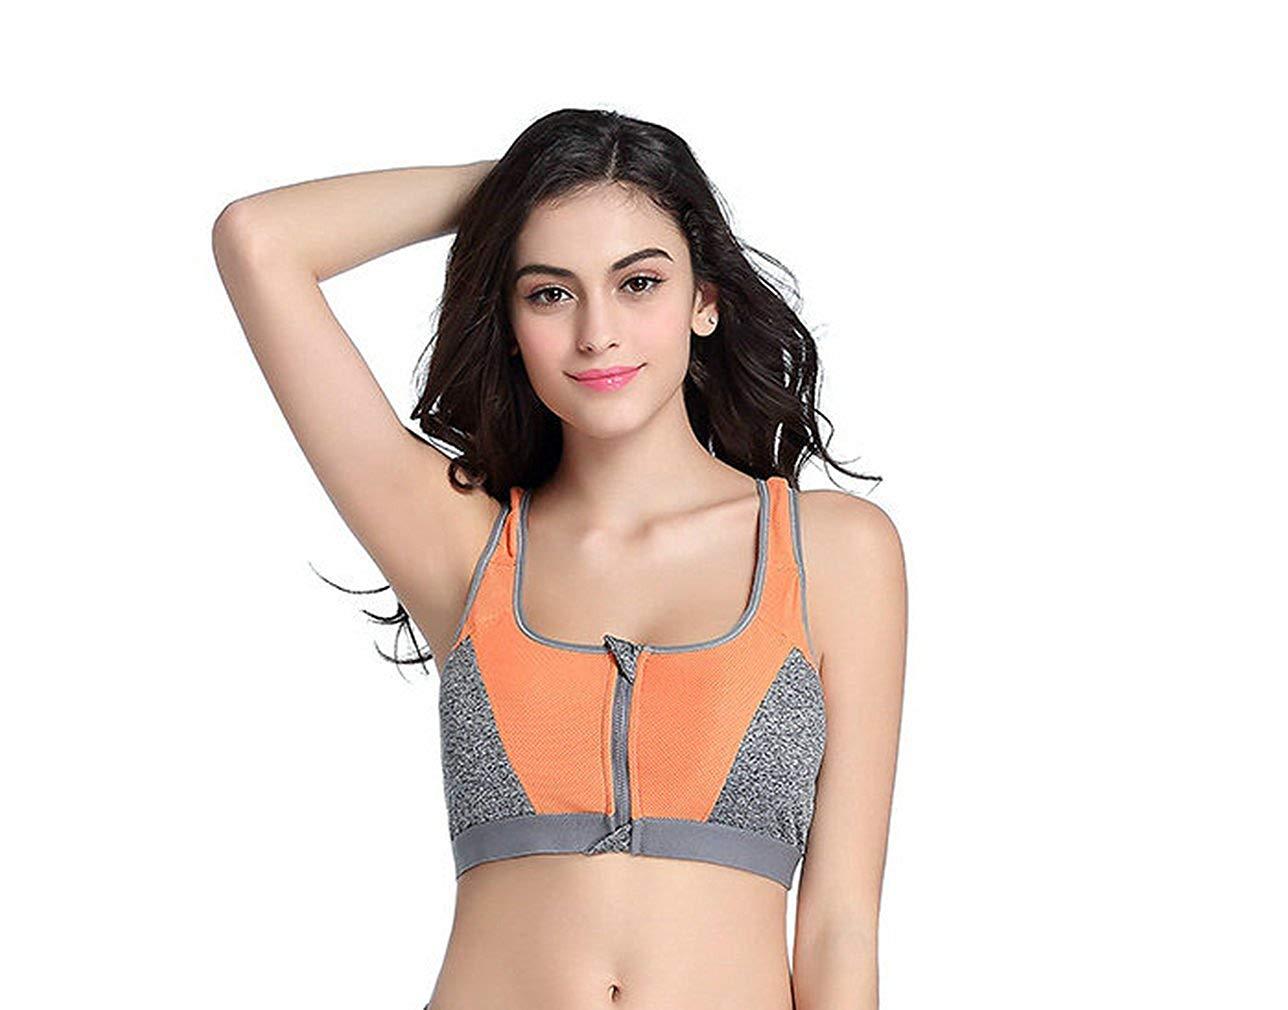 d8d9a0ab83 Get Quotations · CHRISTYZHANG Women s Sports Bras Gym Yoga Top Zipper Front  Breathable Bras Double Wear Bra